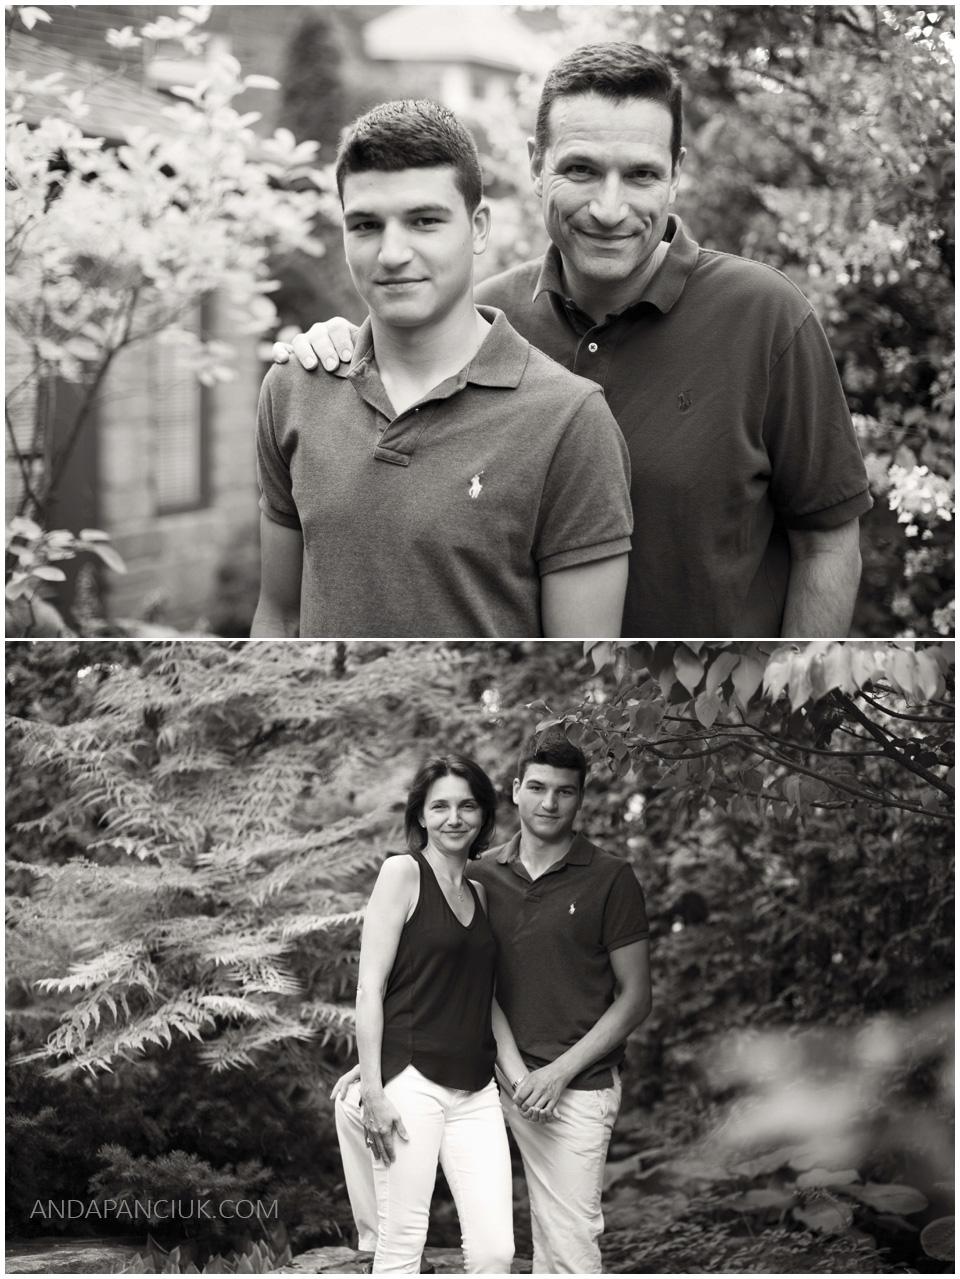 Montreal Family Photographer, Montreal Portrait Photographer, andapanciuk.com